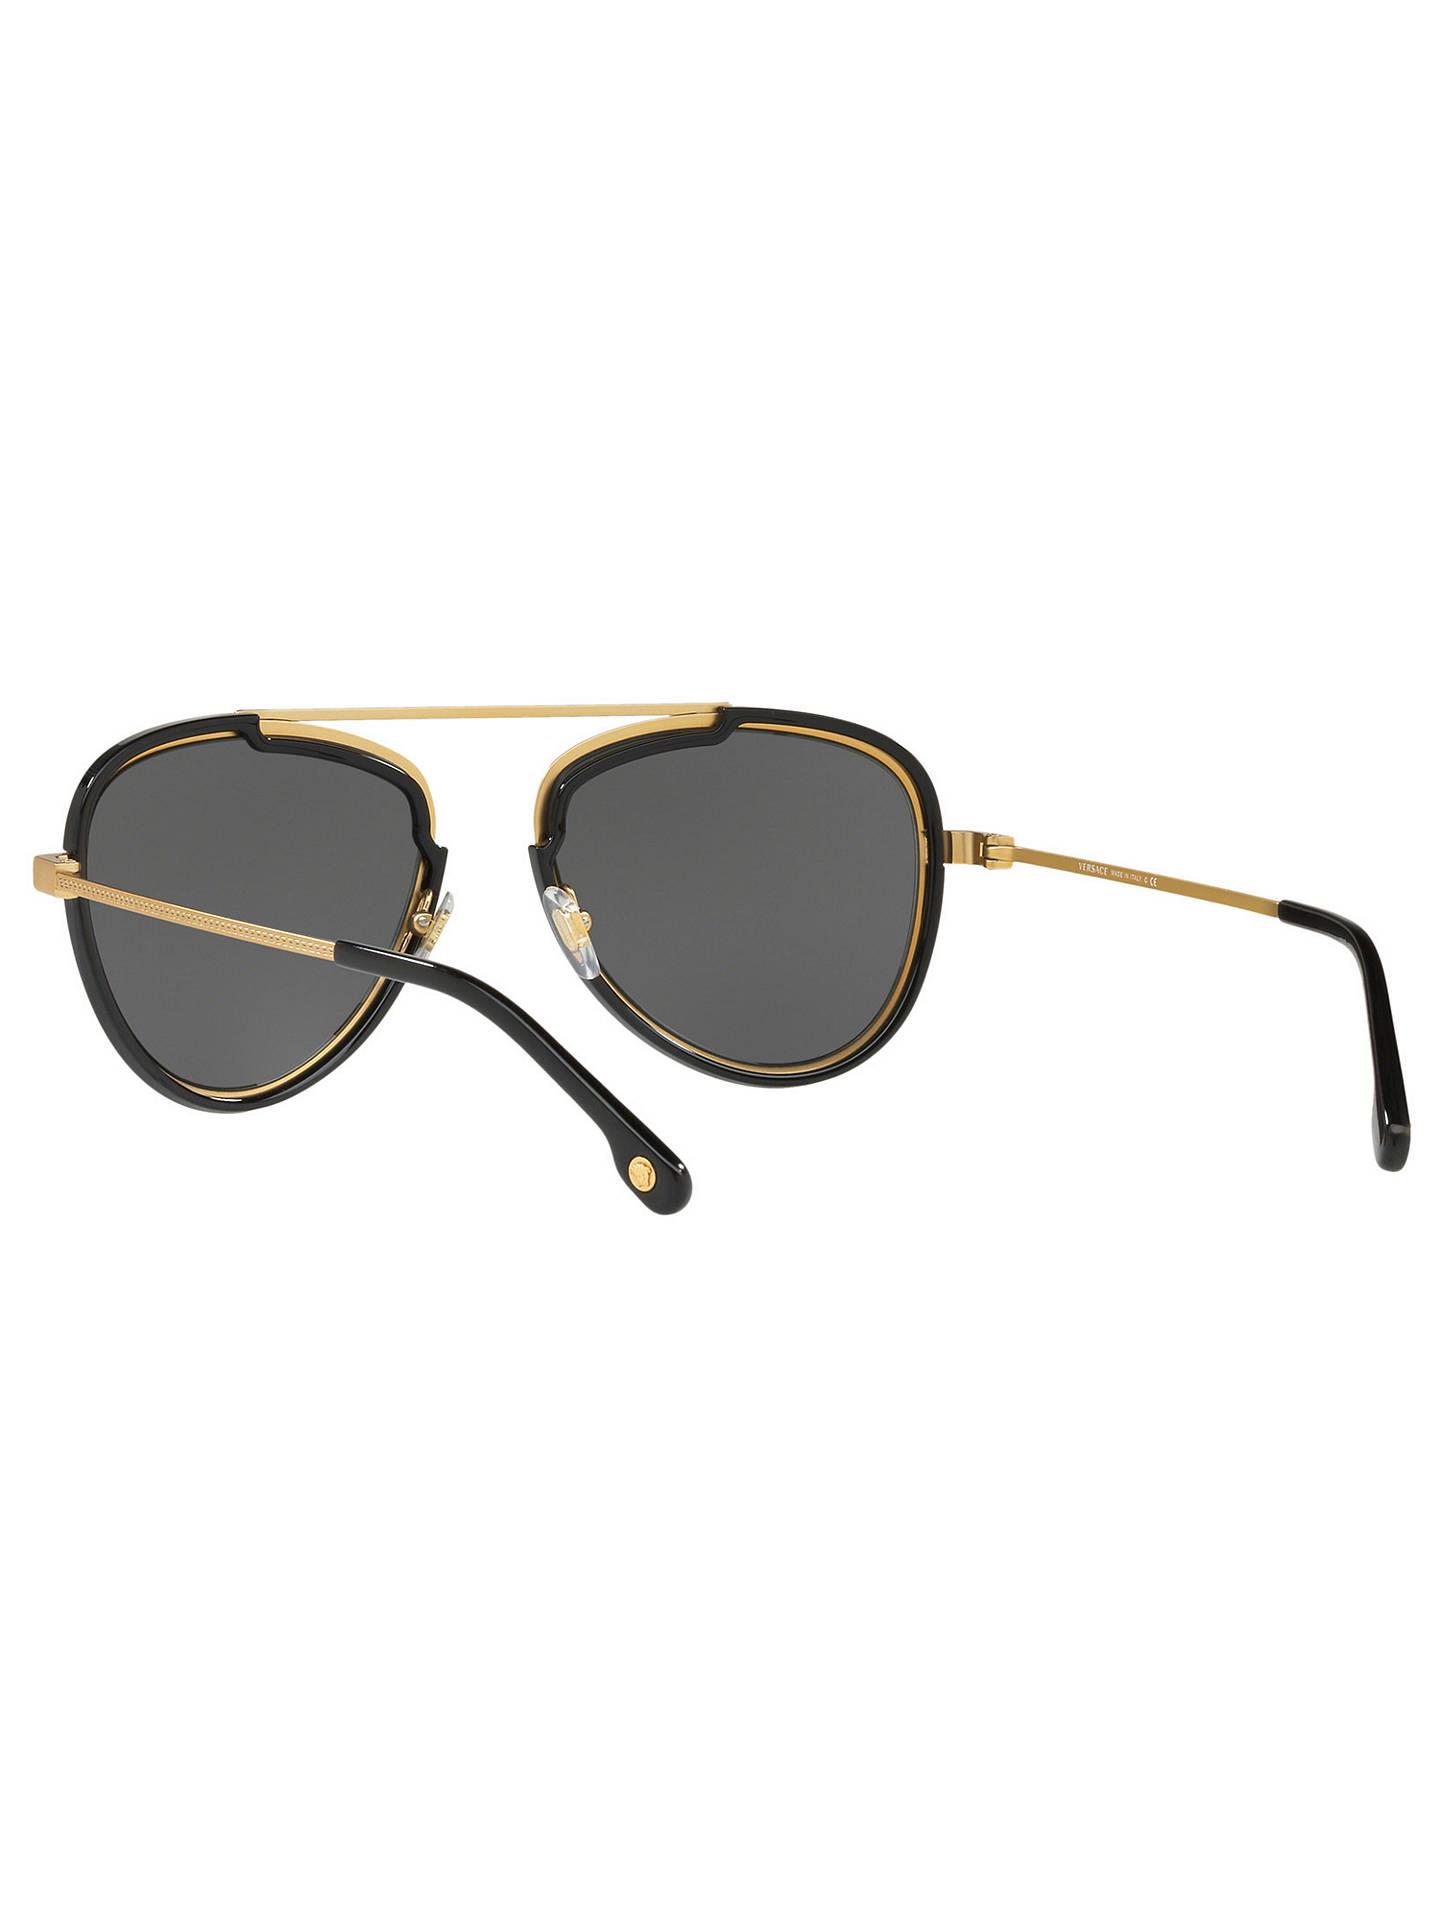 18f2aafd0748 Versace VE2193 Men s Aviator Sunglasses at John Lewis   Partners